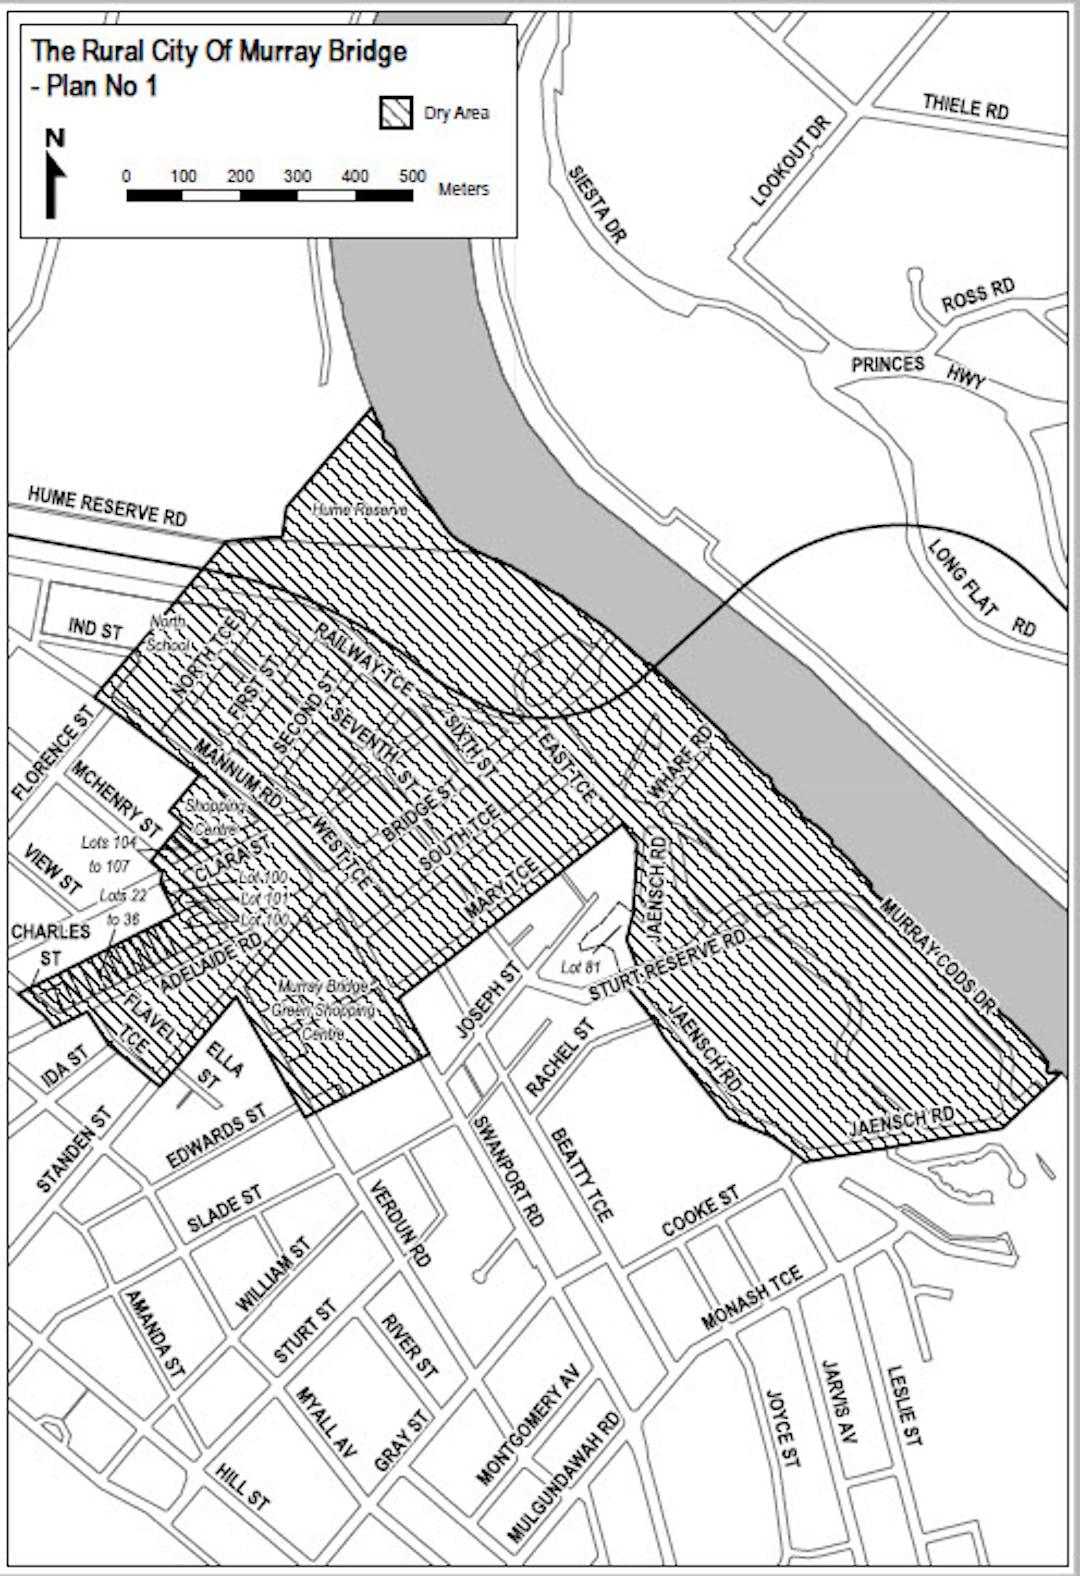 Murray Bridge Dry Zone Renewal Public Consultation